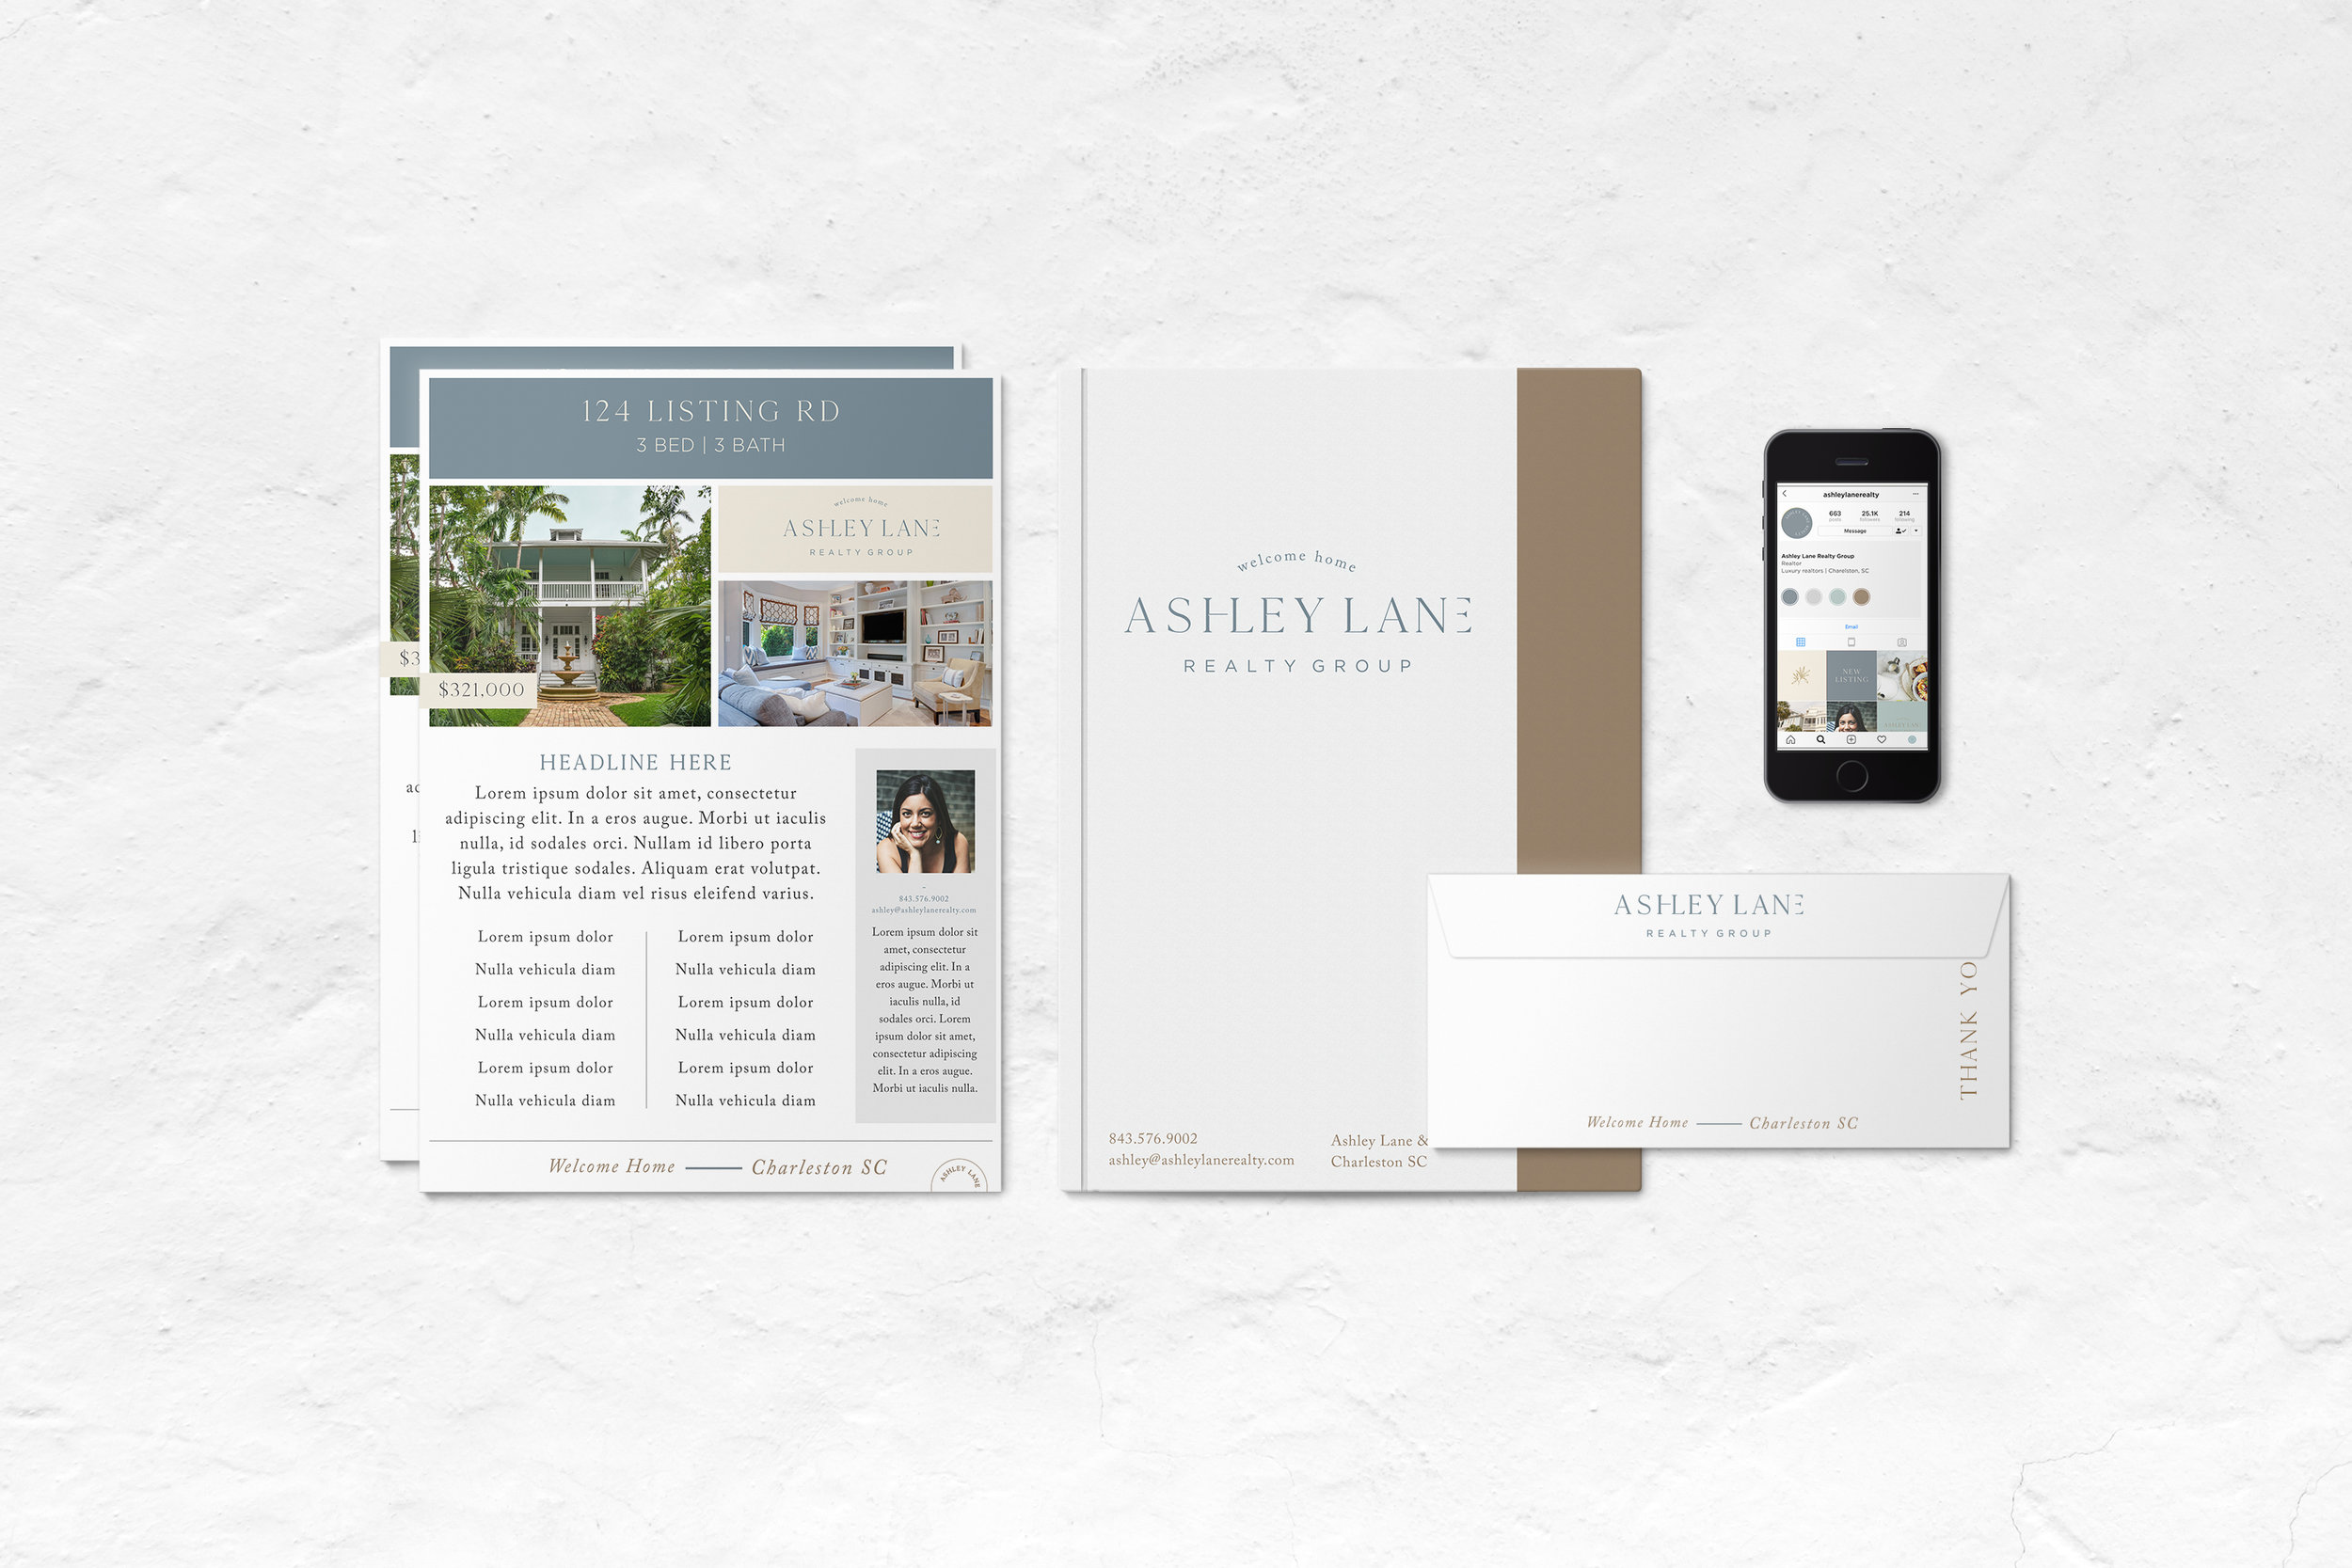 ashley_lane_print.jpg